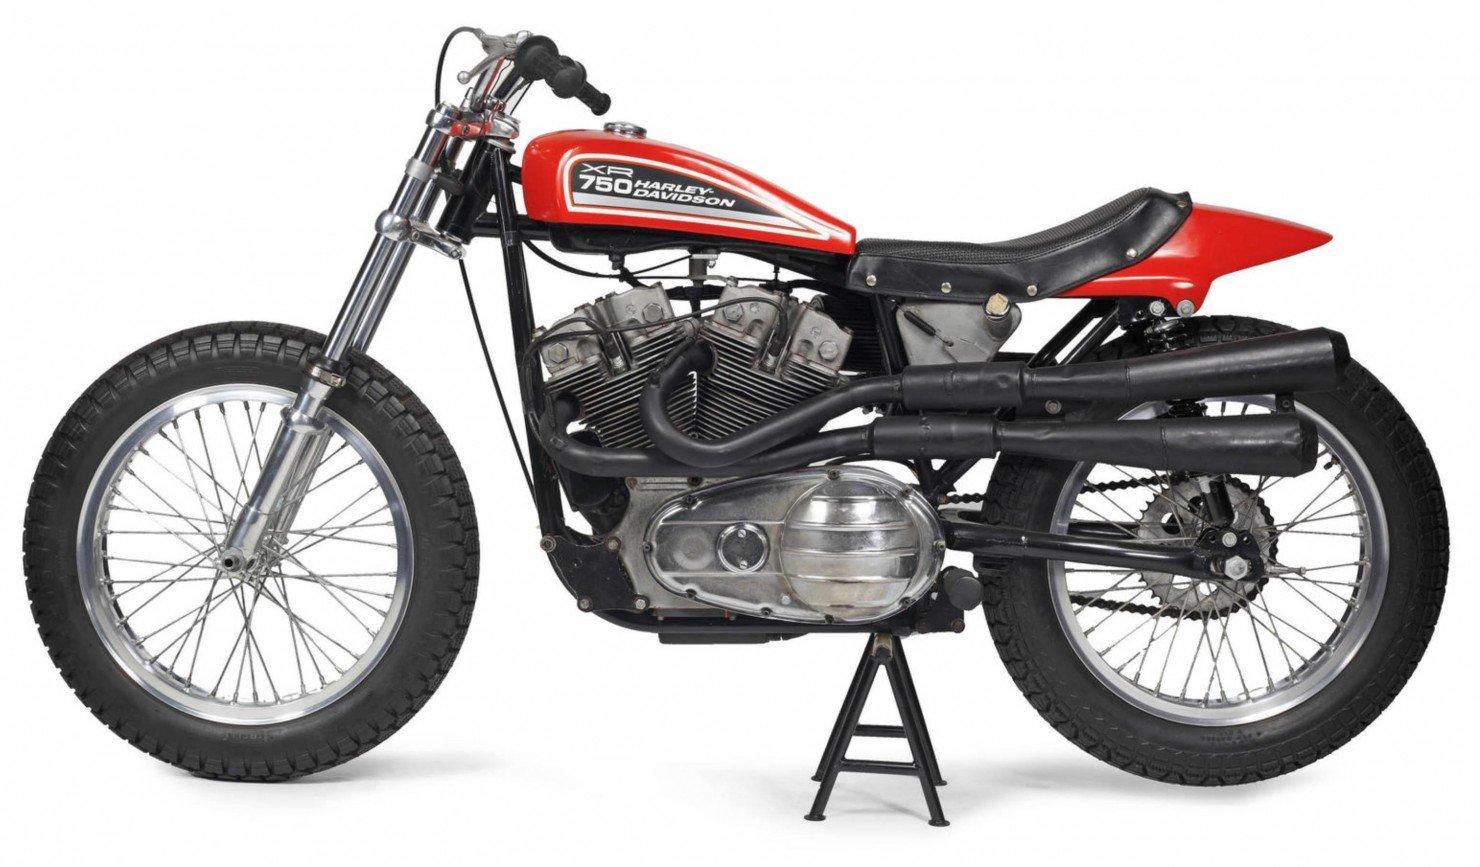 Harley Davidson: 1972 Harley-Davidson XR750